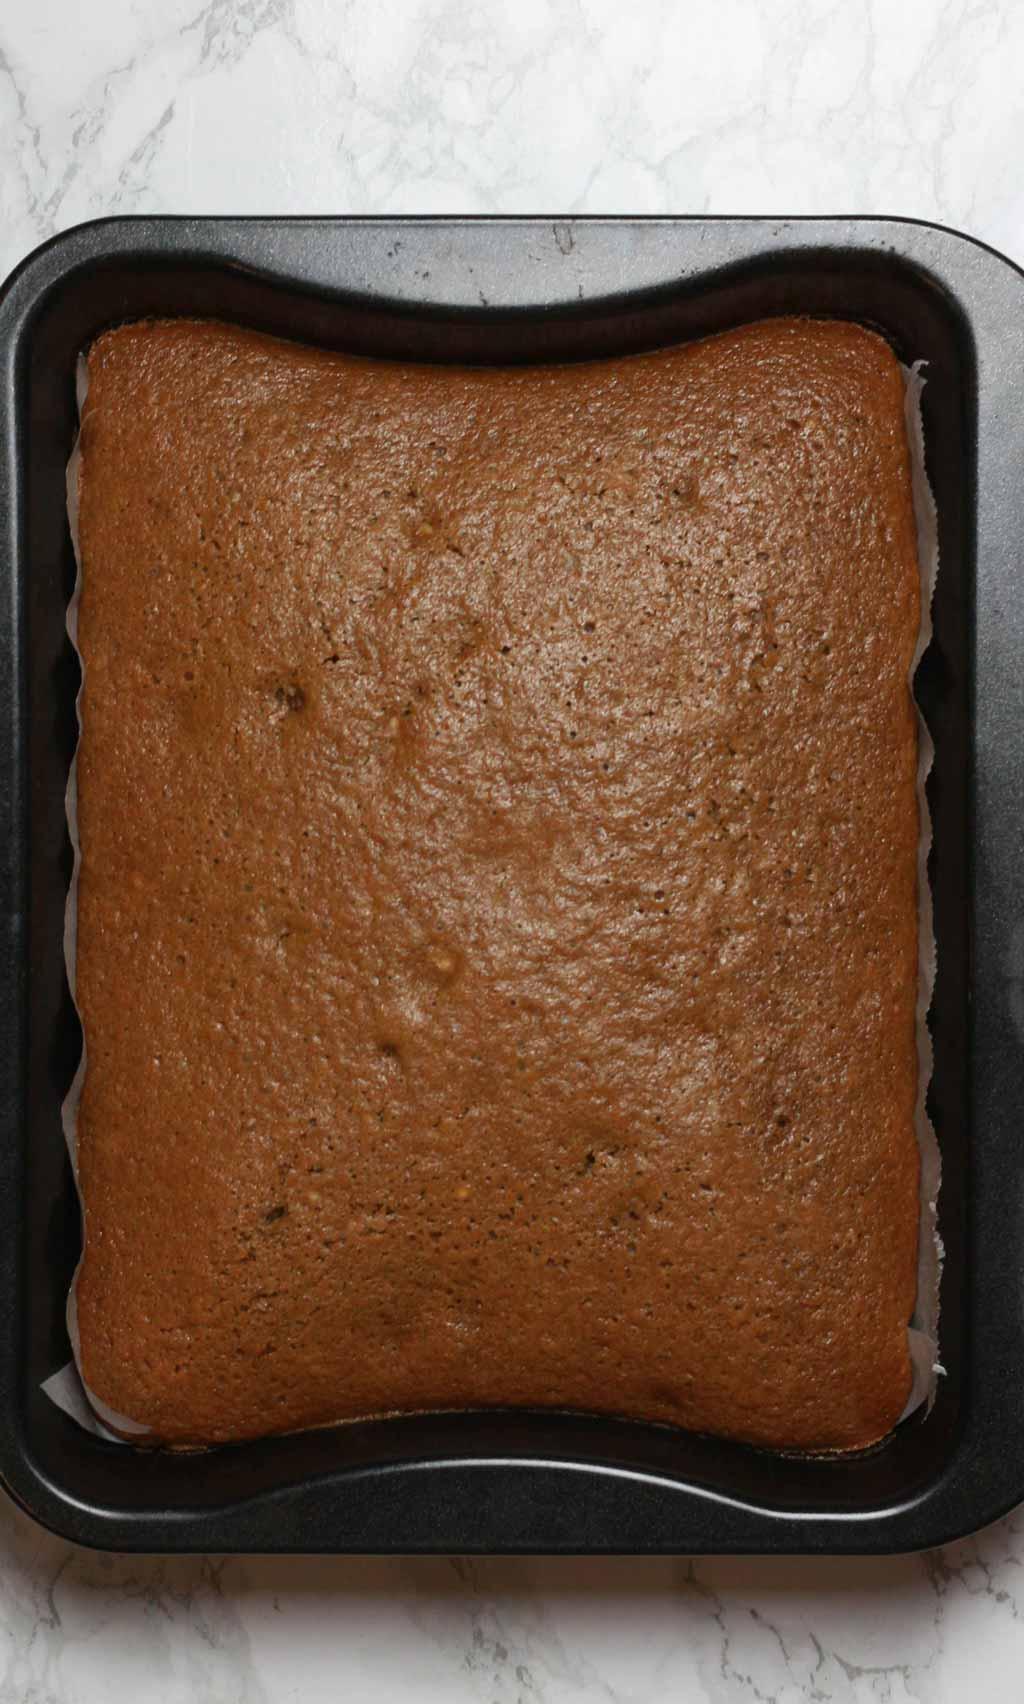 Baked Cake In Tin